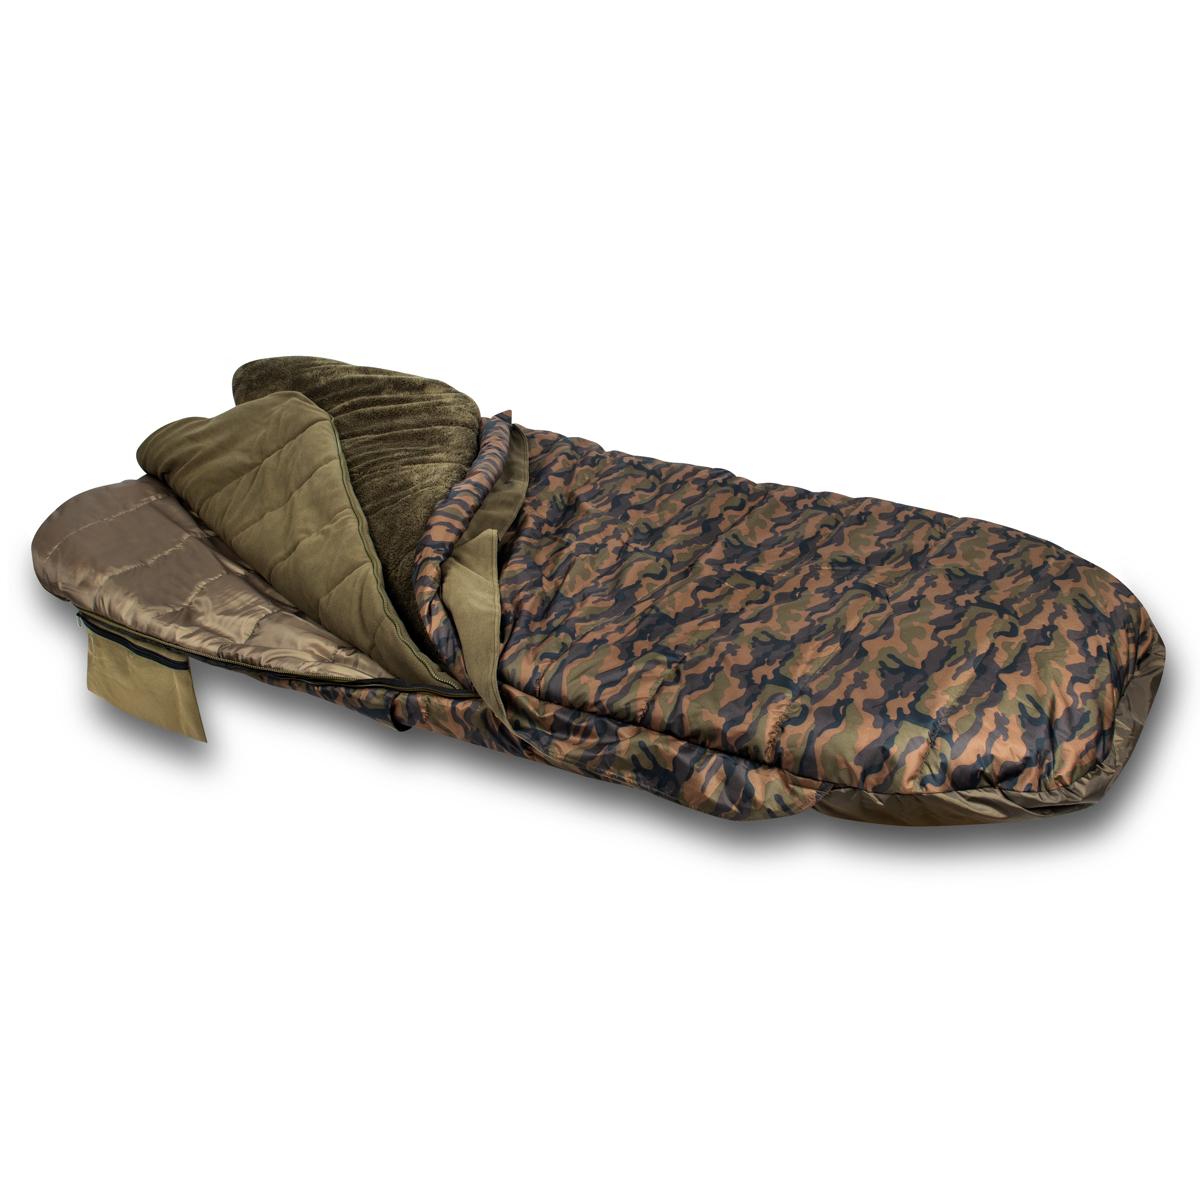 Spací pytel Starfishing Repus Pro 365 2v1 Fleece Camo